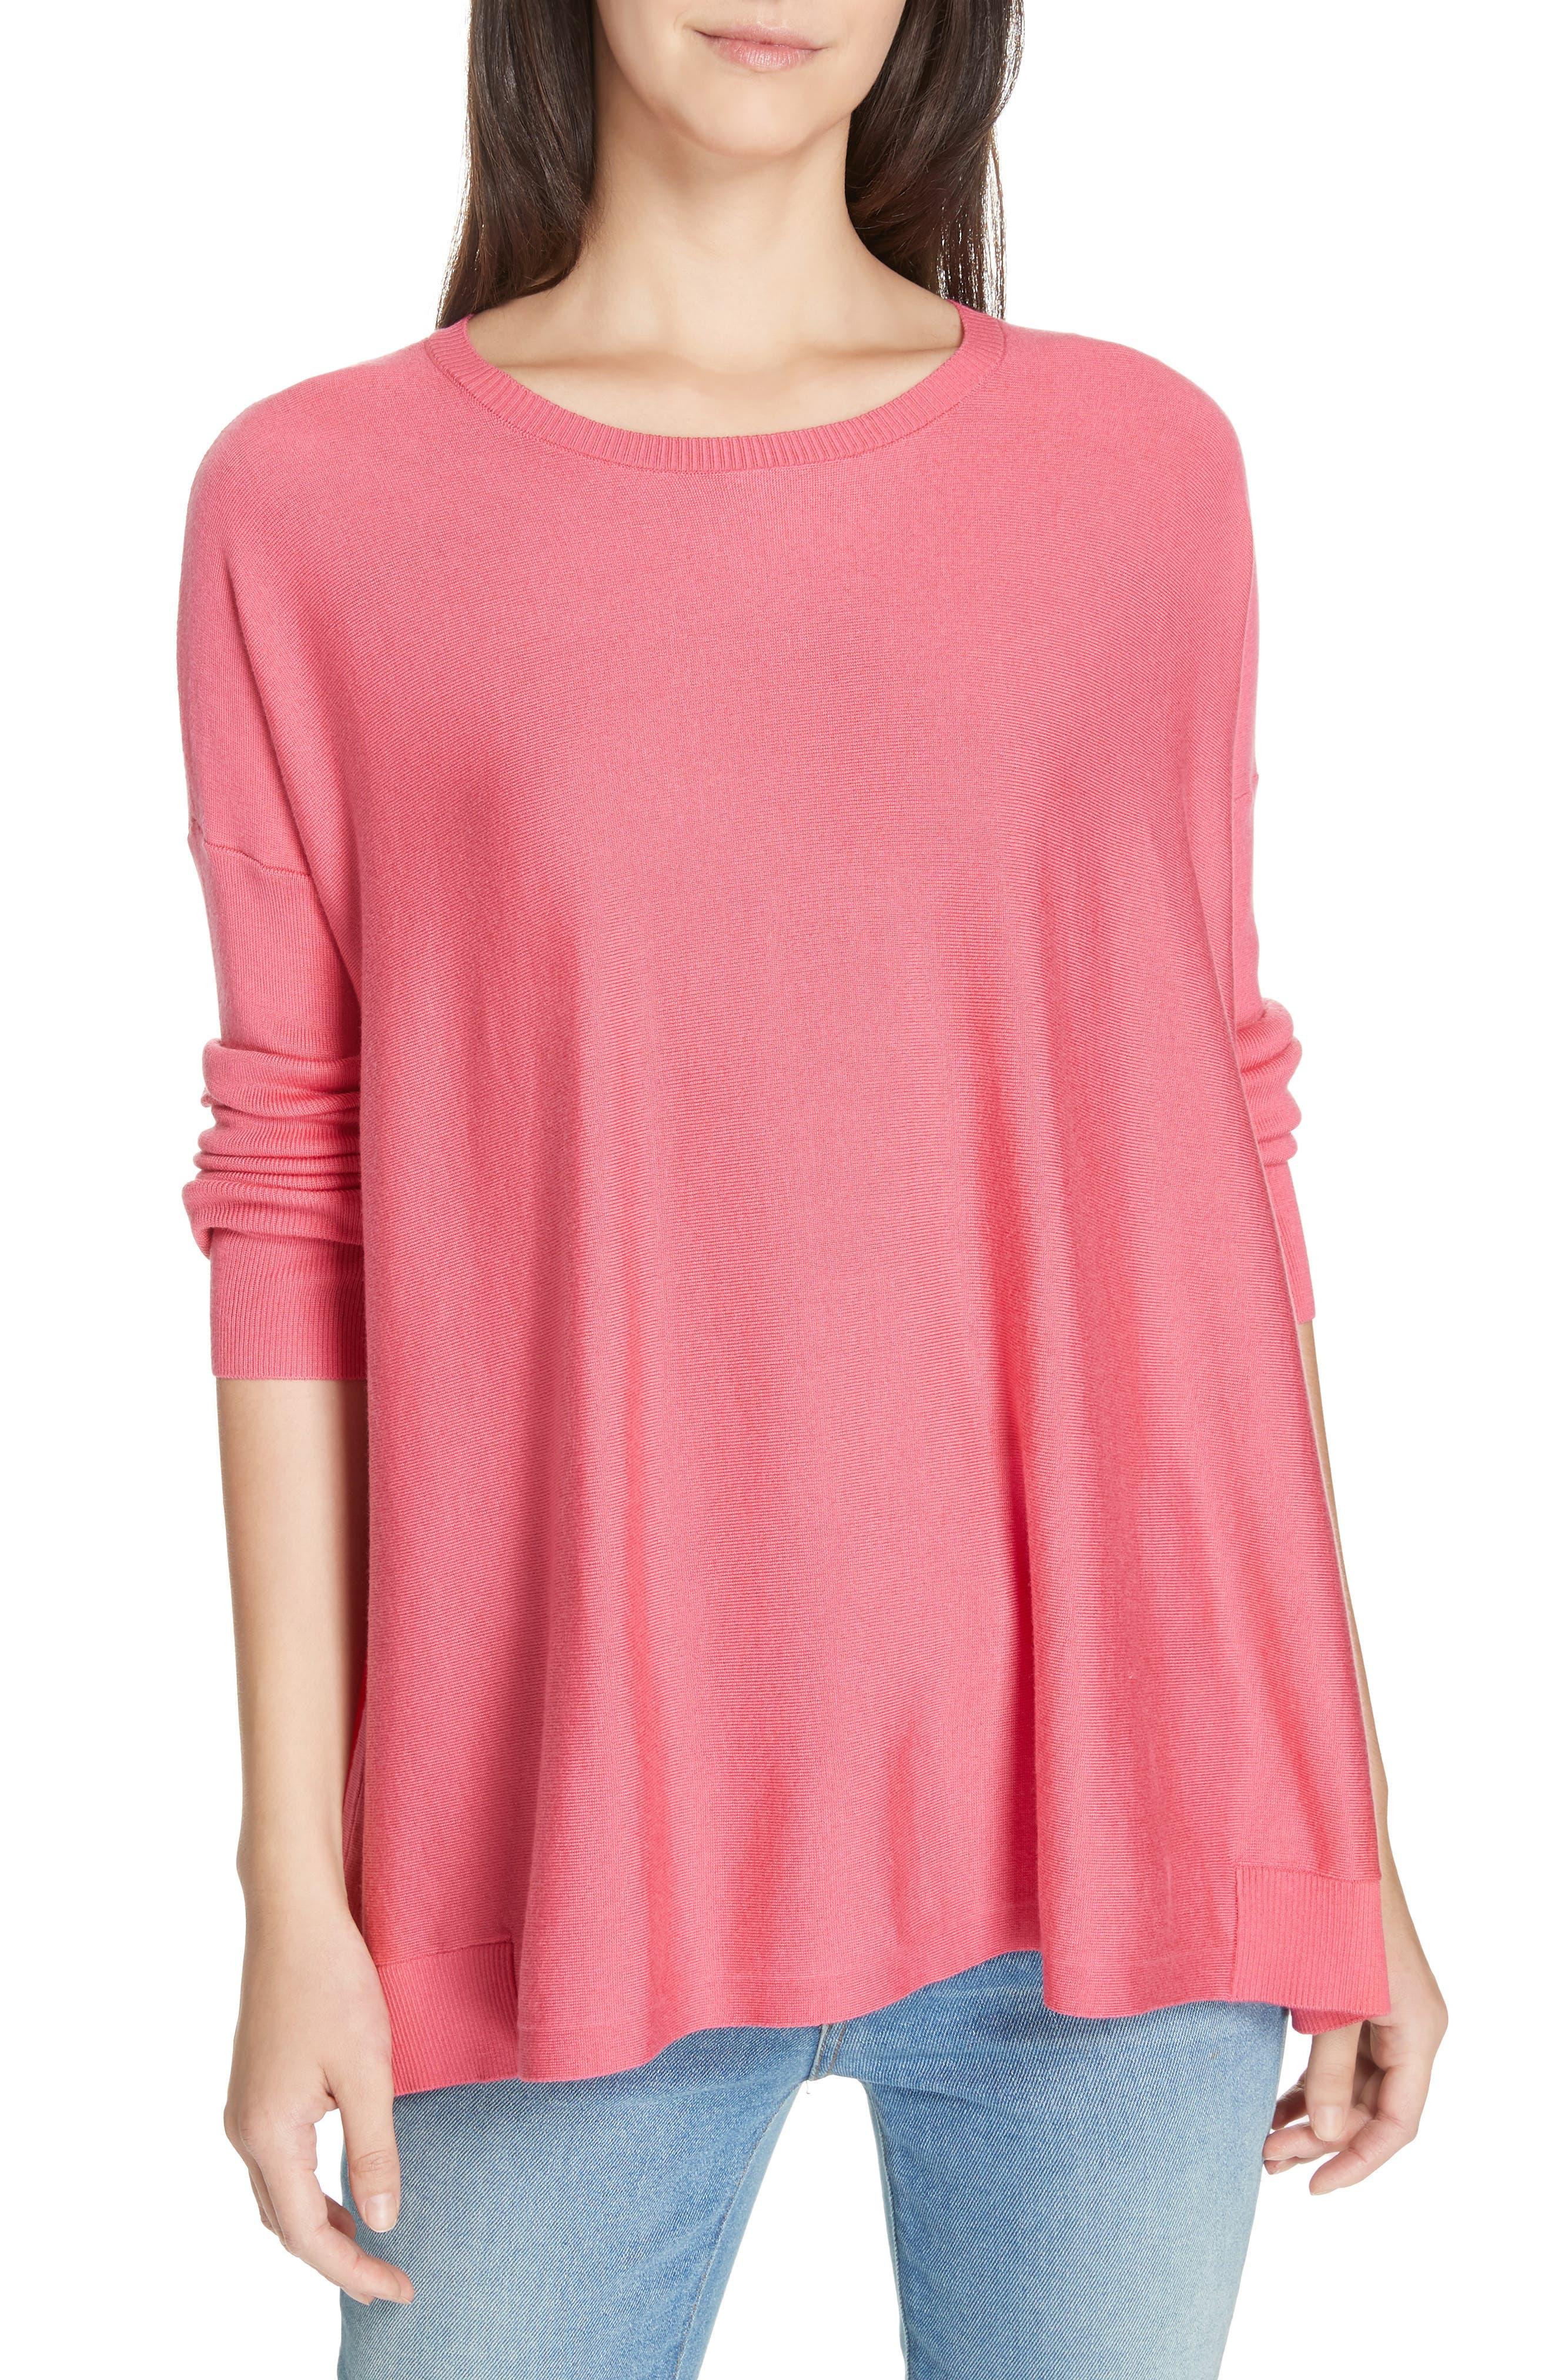 Tencel<sup>®</sup> Lyocell Blend Sweater,                             Main thumbnail 1, color,                             CHERRY LANE